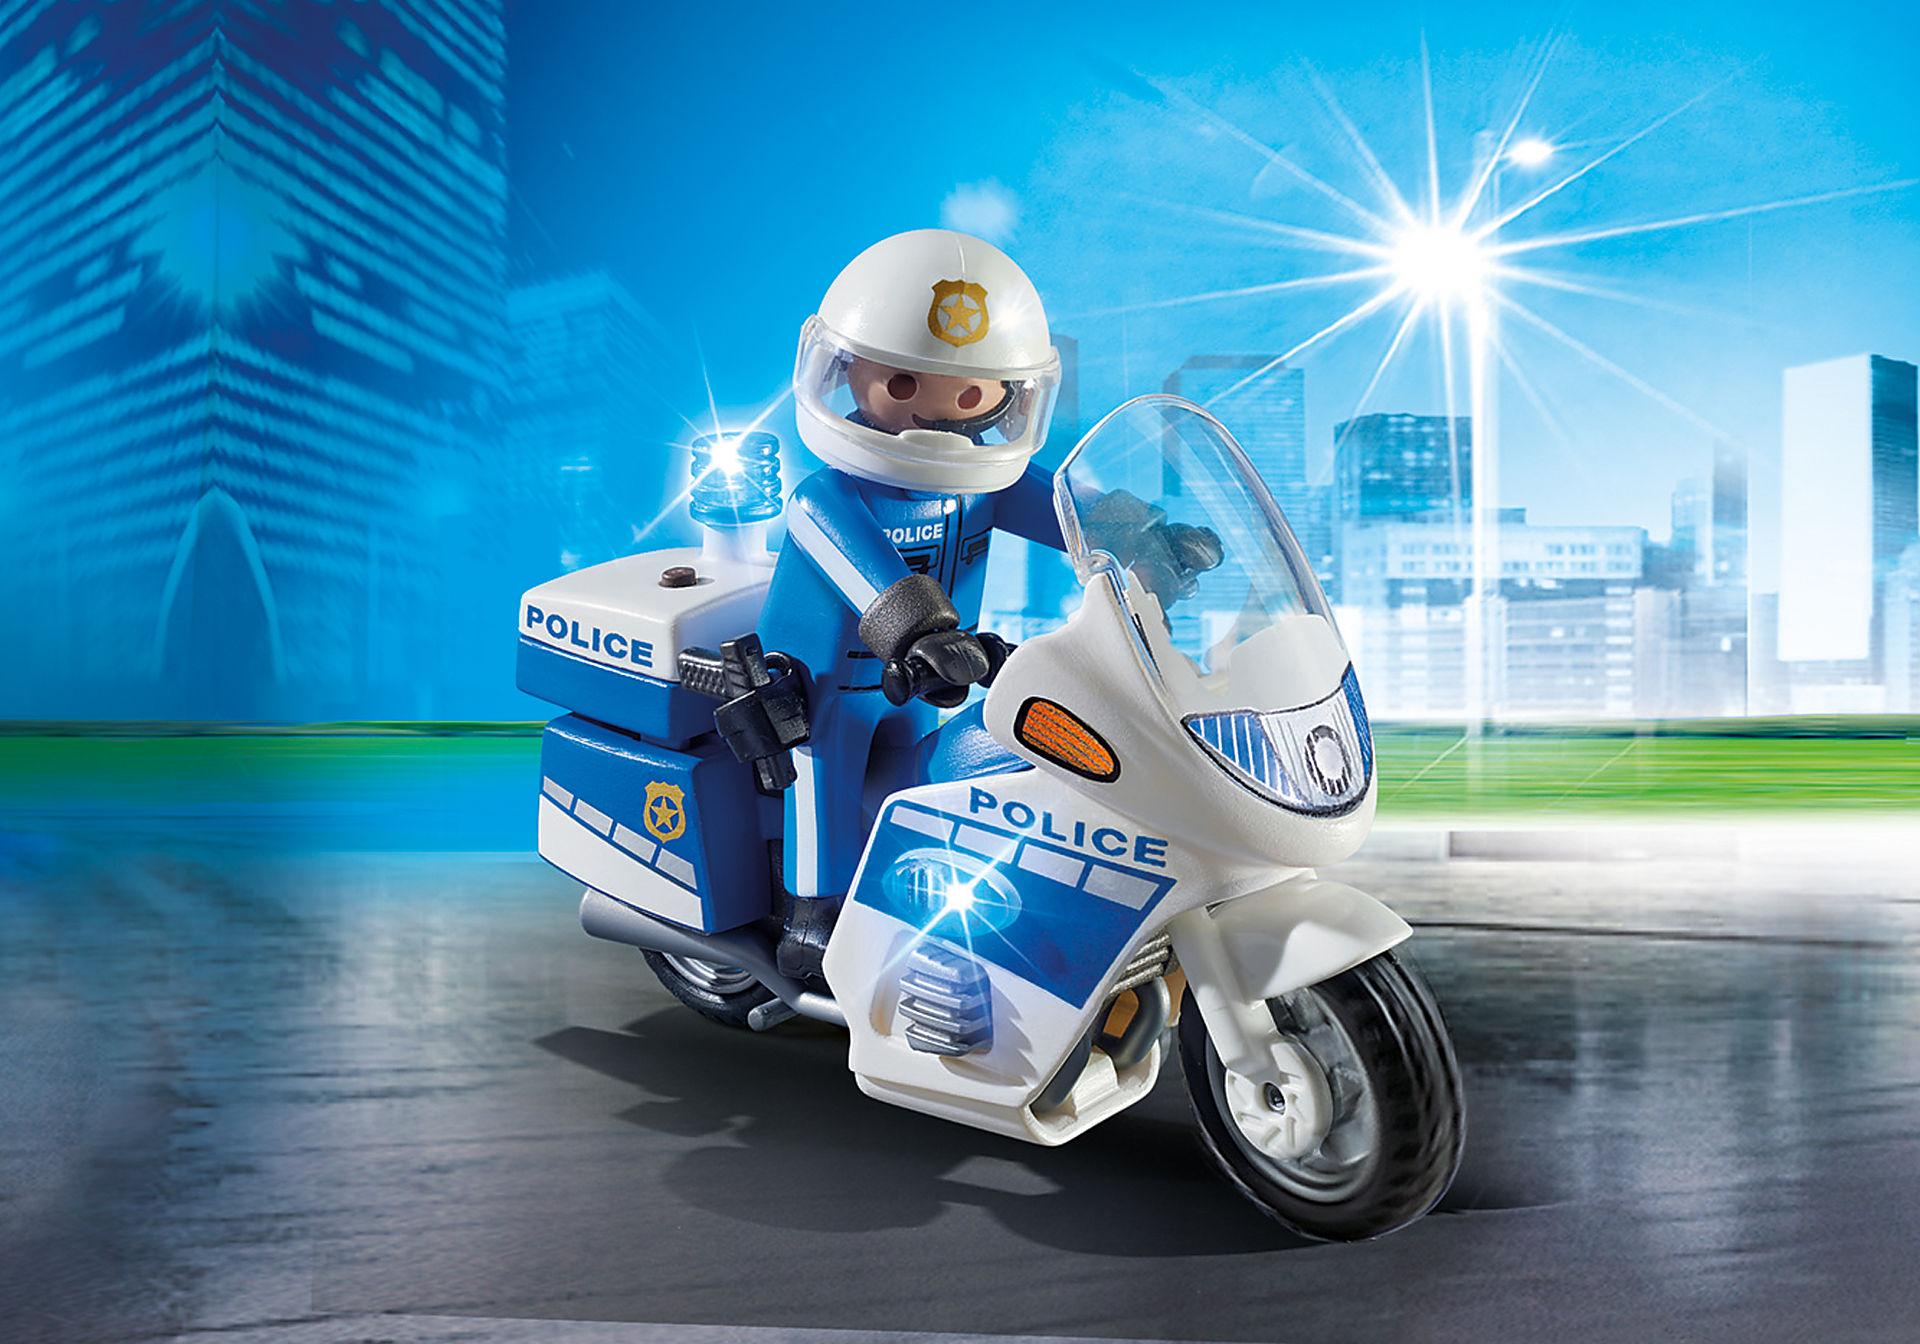 http://media.playmobil.com/i/playmobil/6923_product_detail/Politiemotor met LED-licht